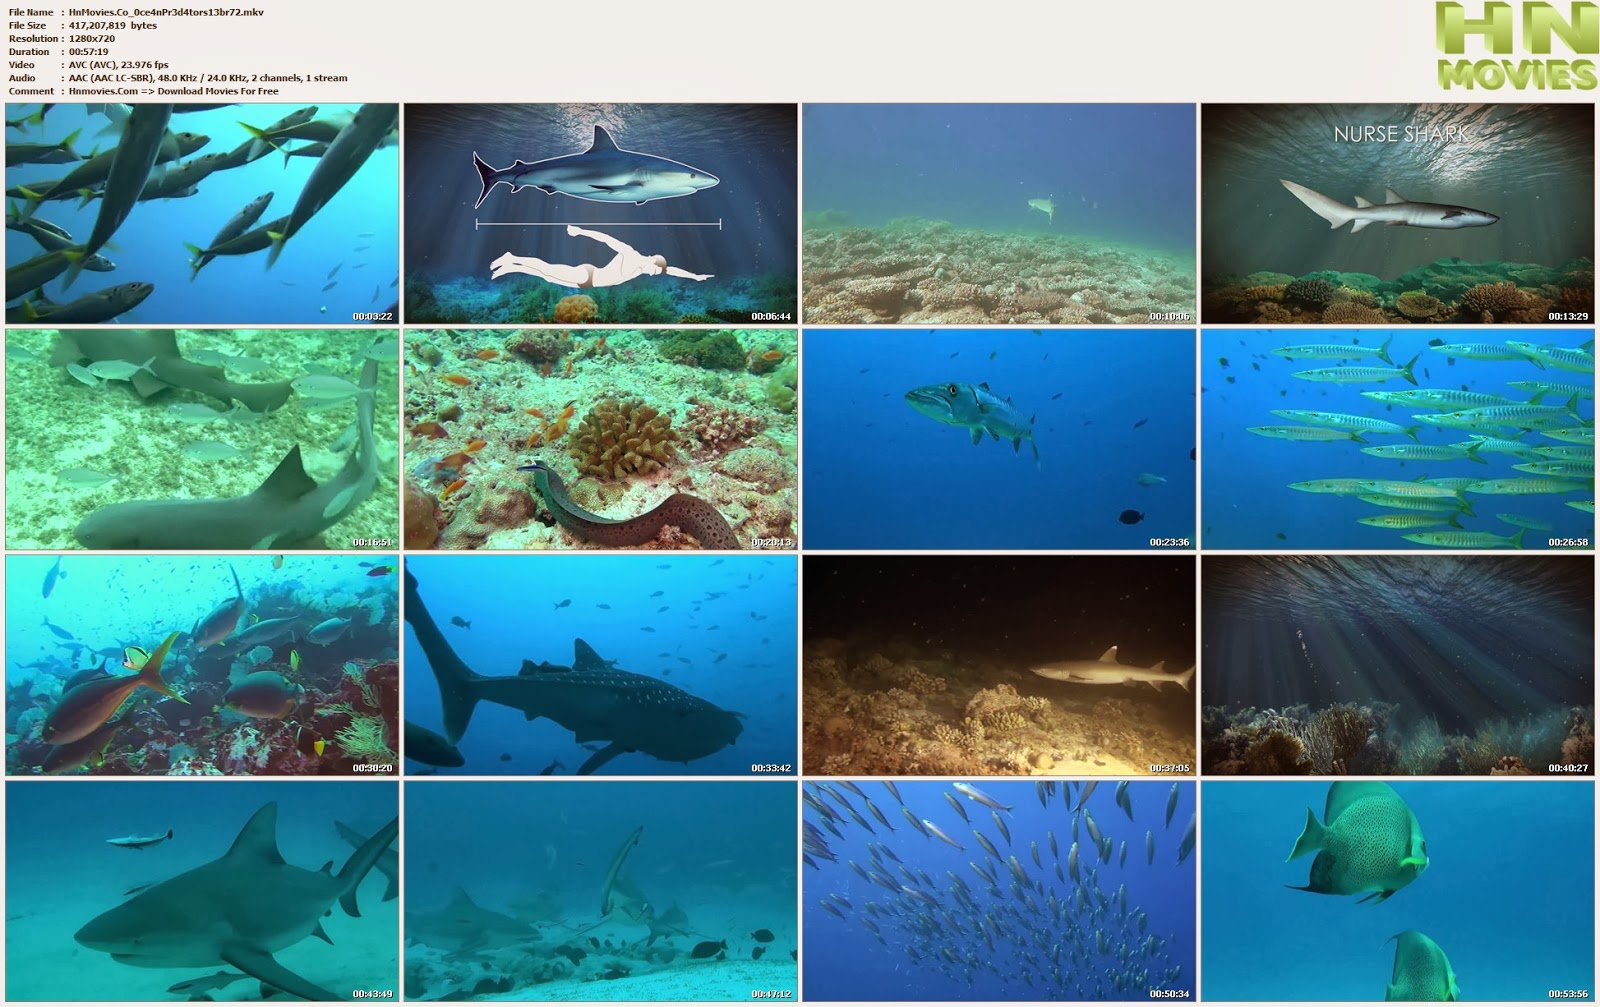 movie screenshot of Ocean Predators fdmovie.com